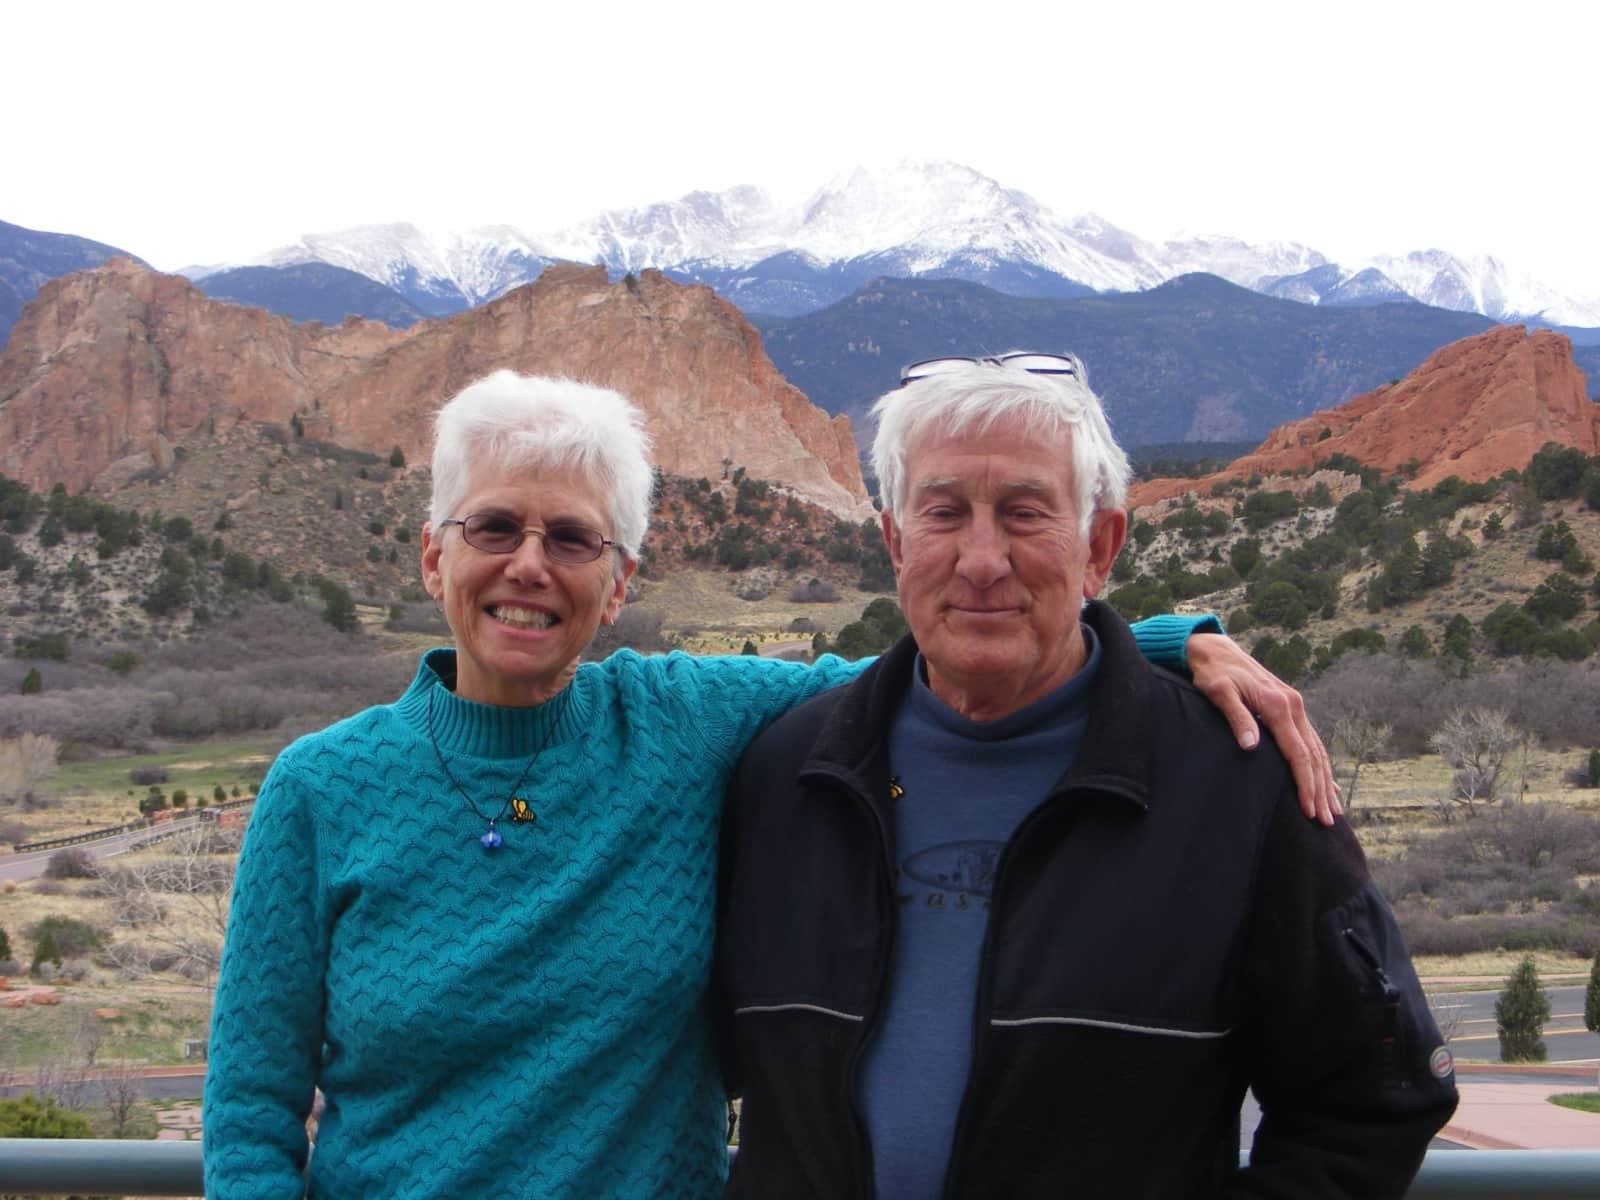 Robert & Colleen from Springboro, Ohio, United States